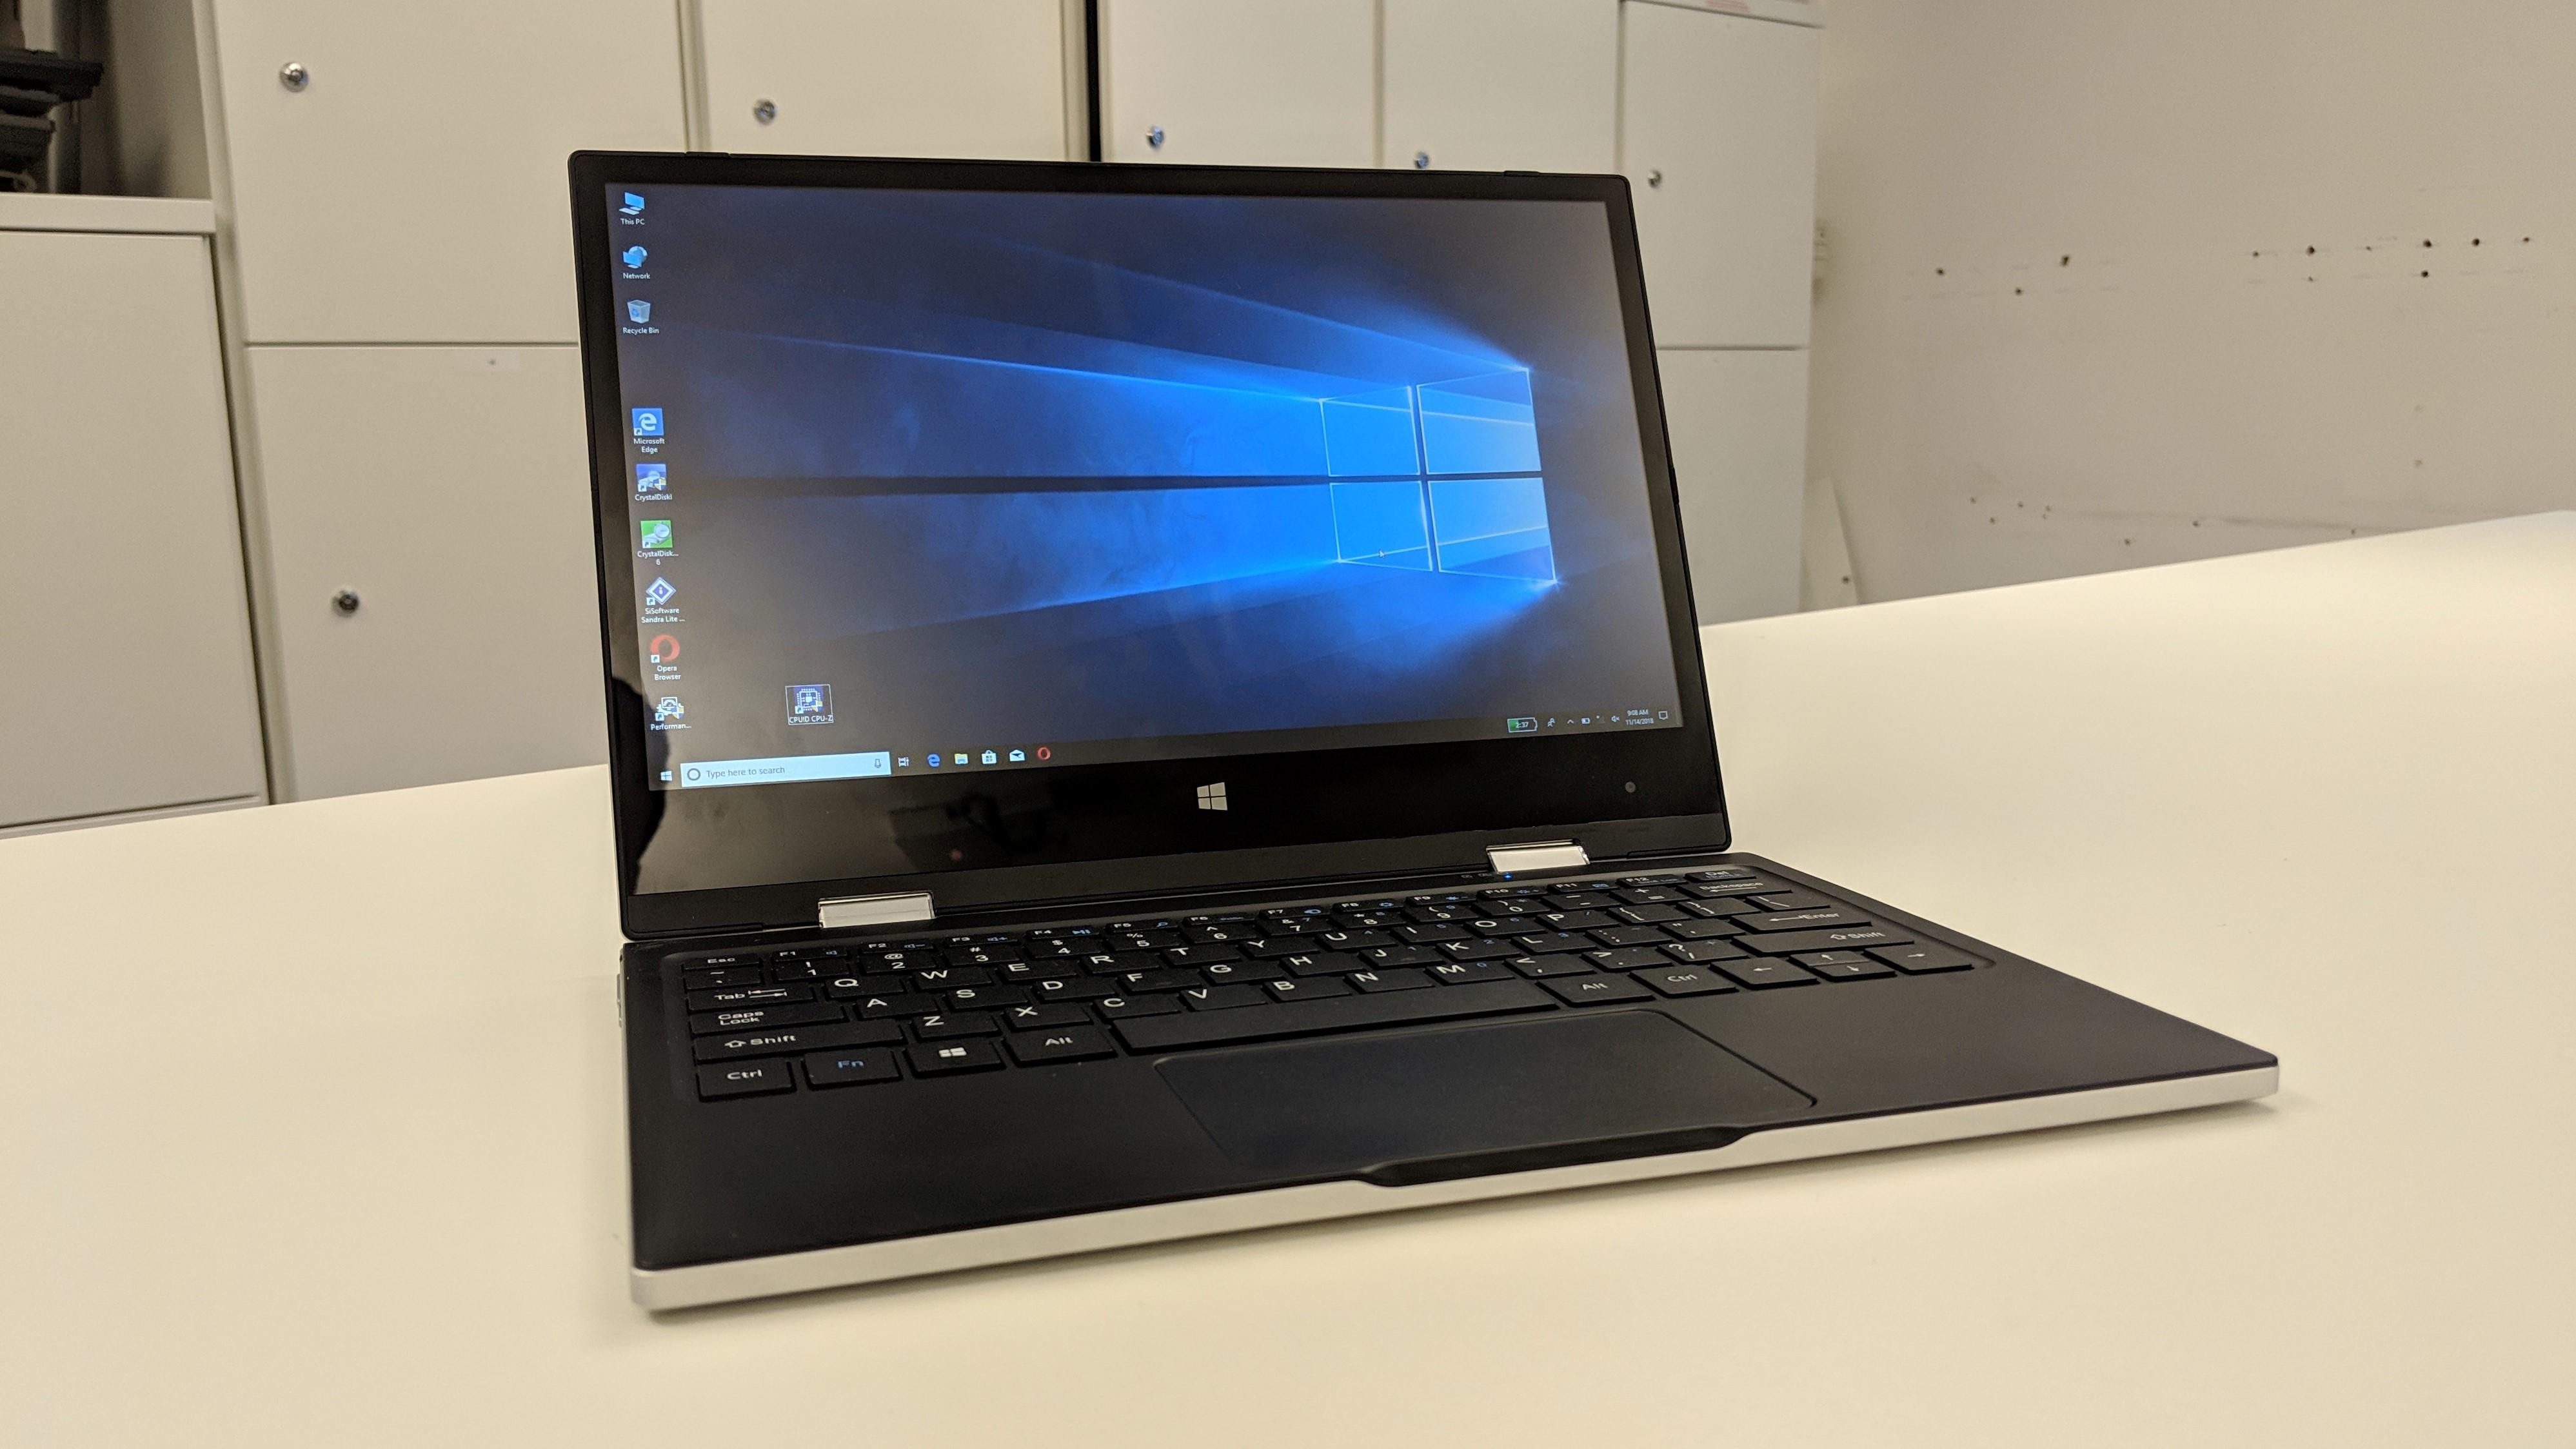 Jumper Ezbook X1 Convertible 2 In 1 Laptop Review Techradar